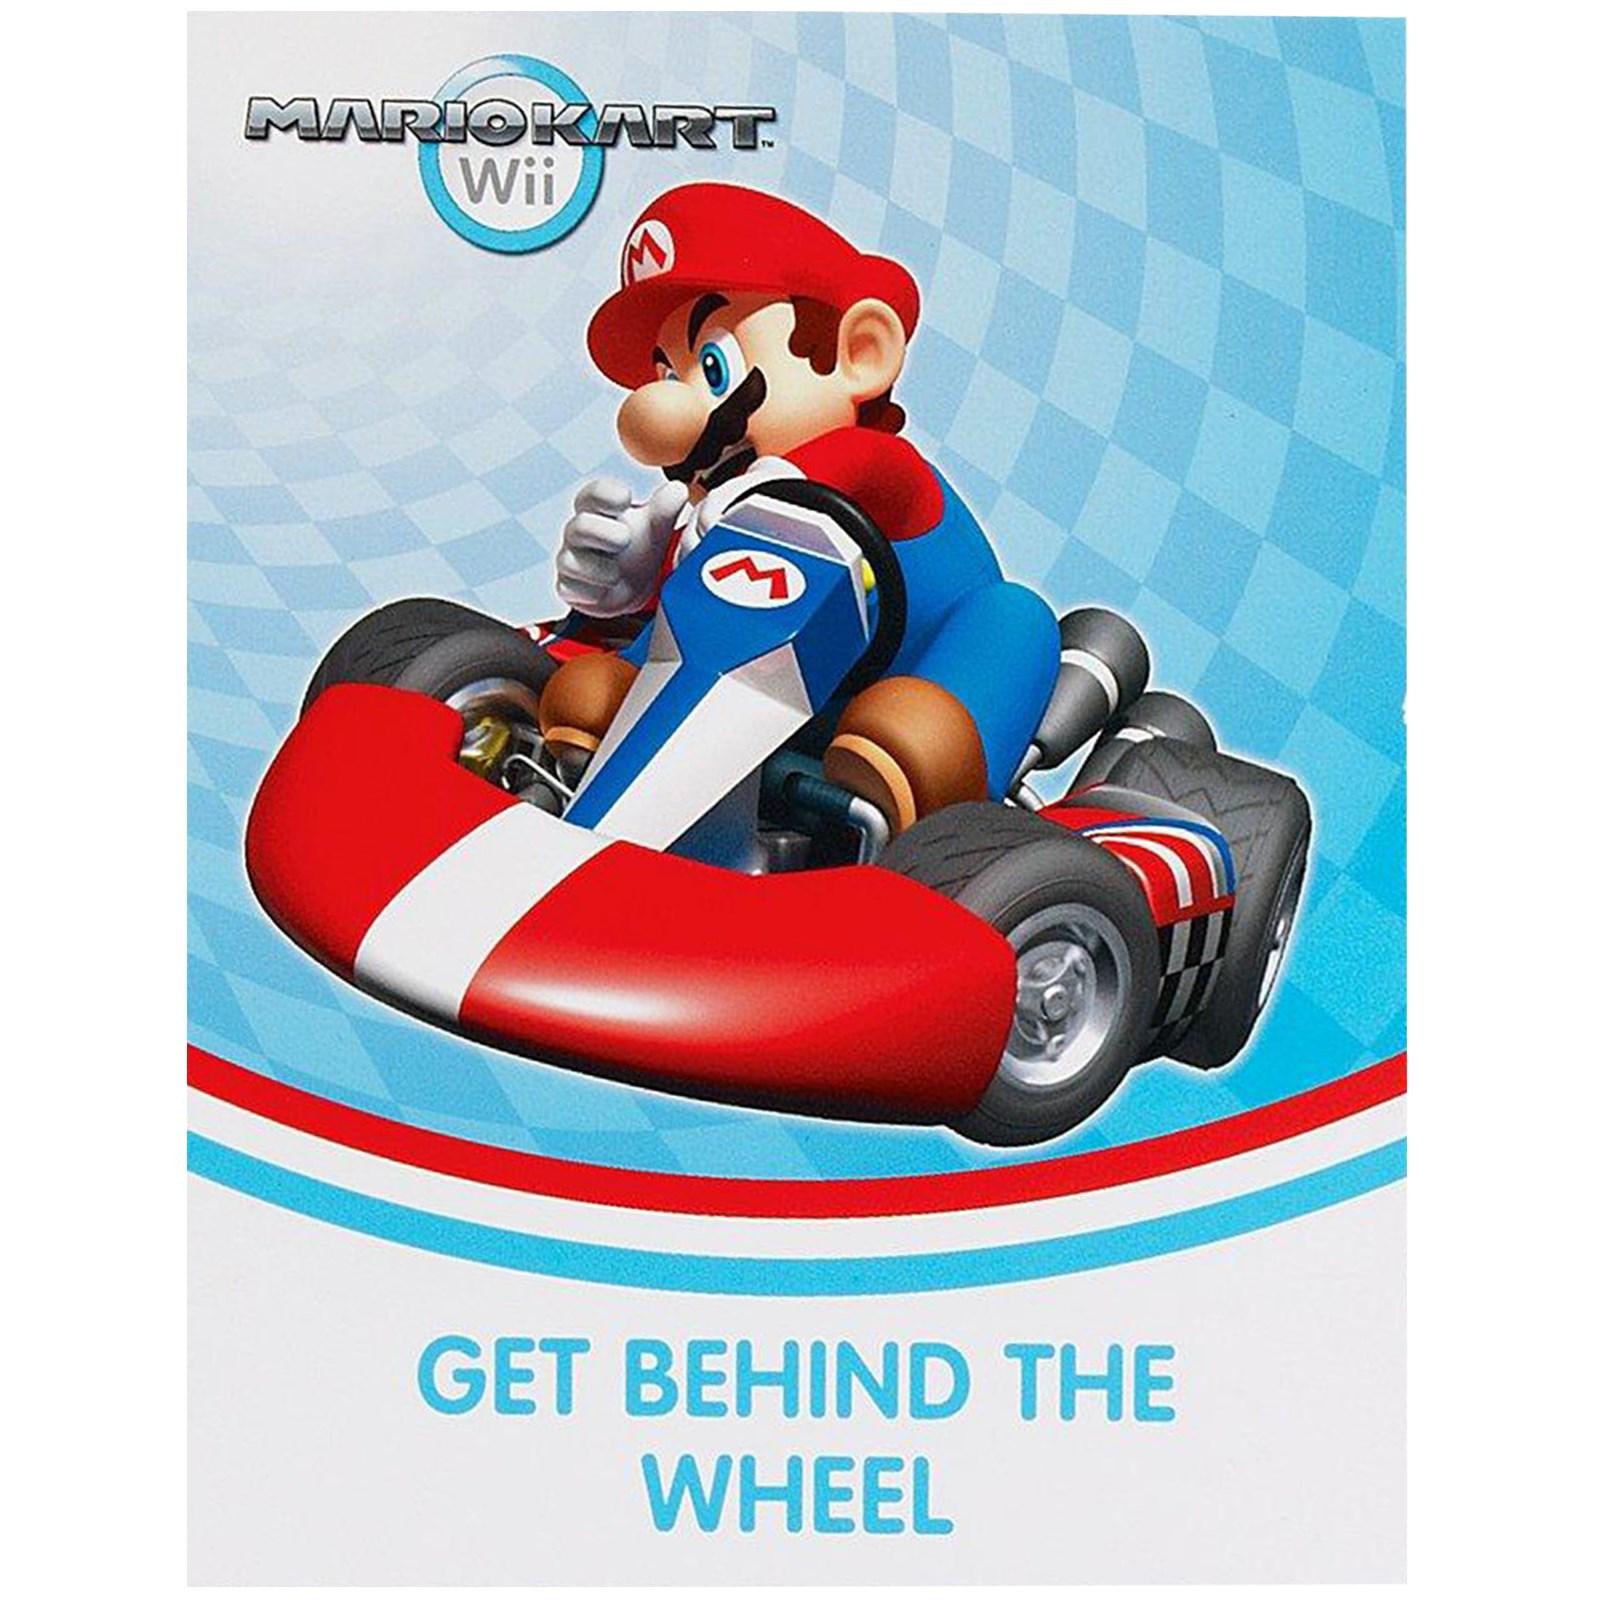 Mario Kart Wii Invitations – Mario Kart Party Invitations